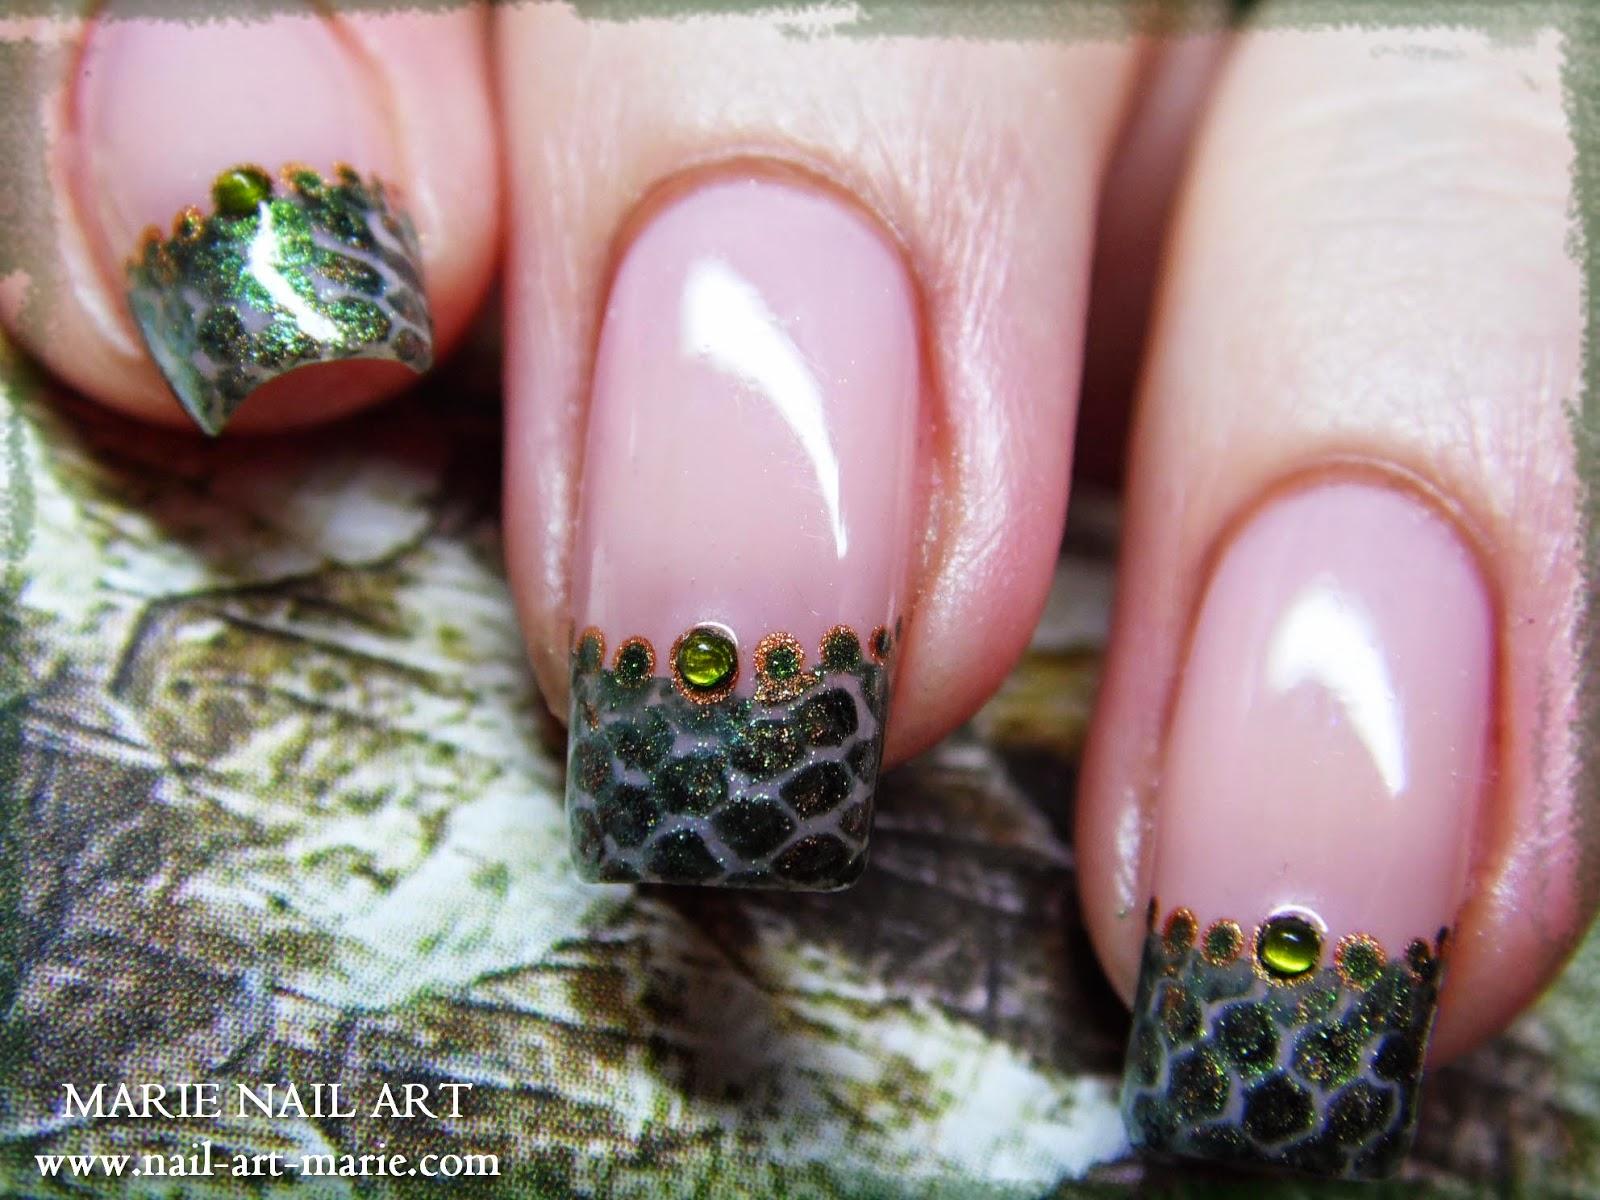 nail art effet peau de serpent4